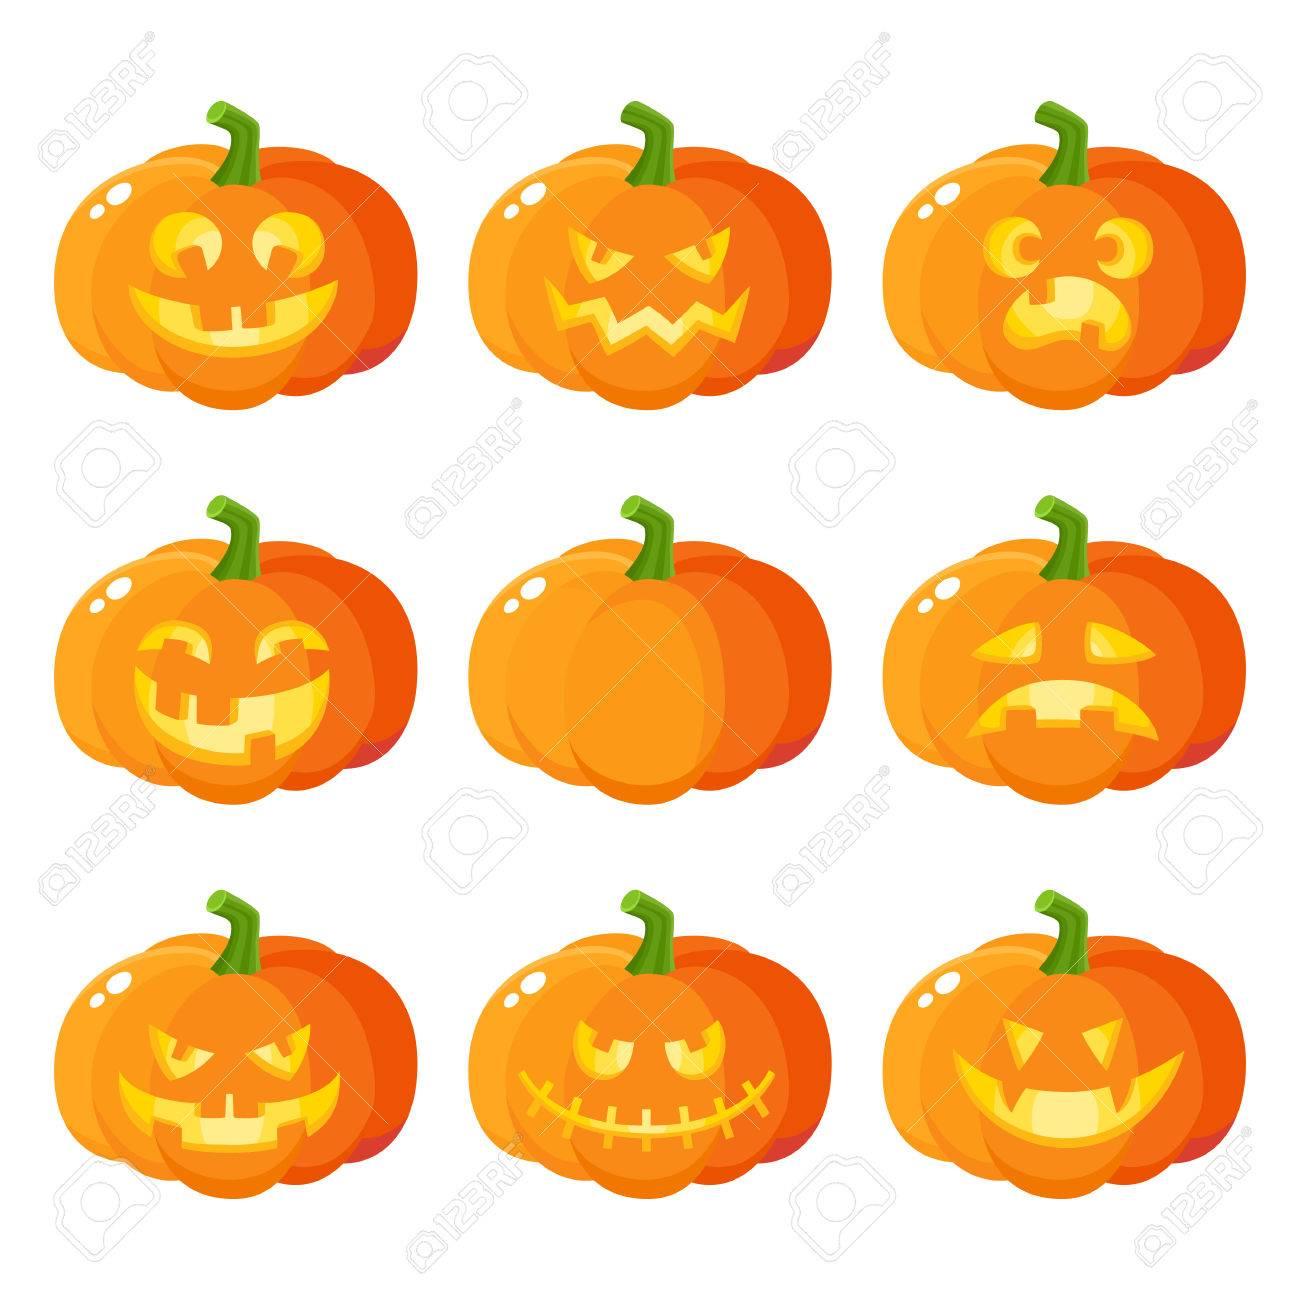 Set of Halloween pumpkin jack-o-lanterns showing various emotions, cartoon vector illustration isolated on white background. Set of pumpkin, jack o lantern emoticons, traditional Halloween symbol - 81452745